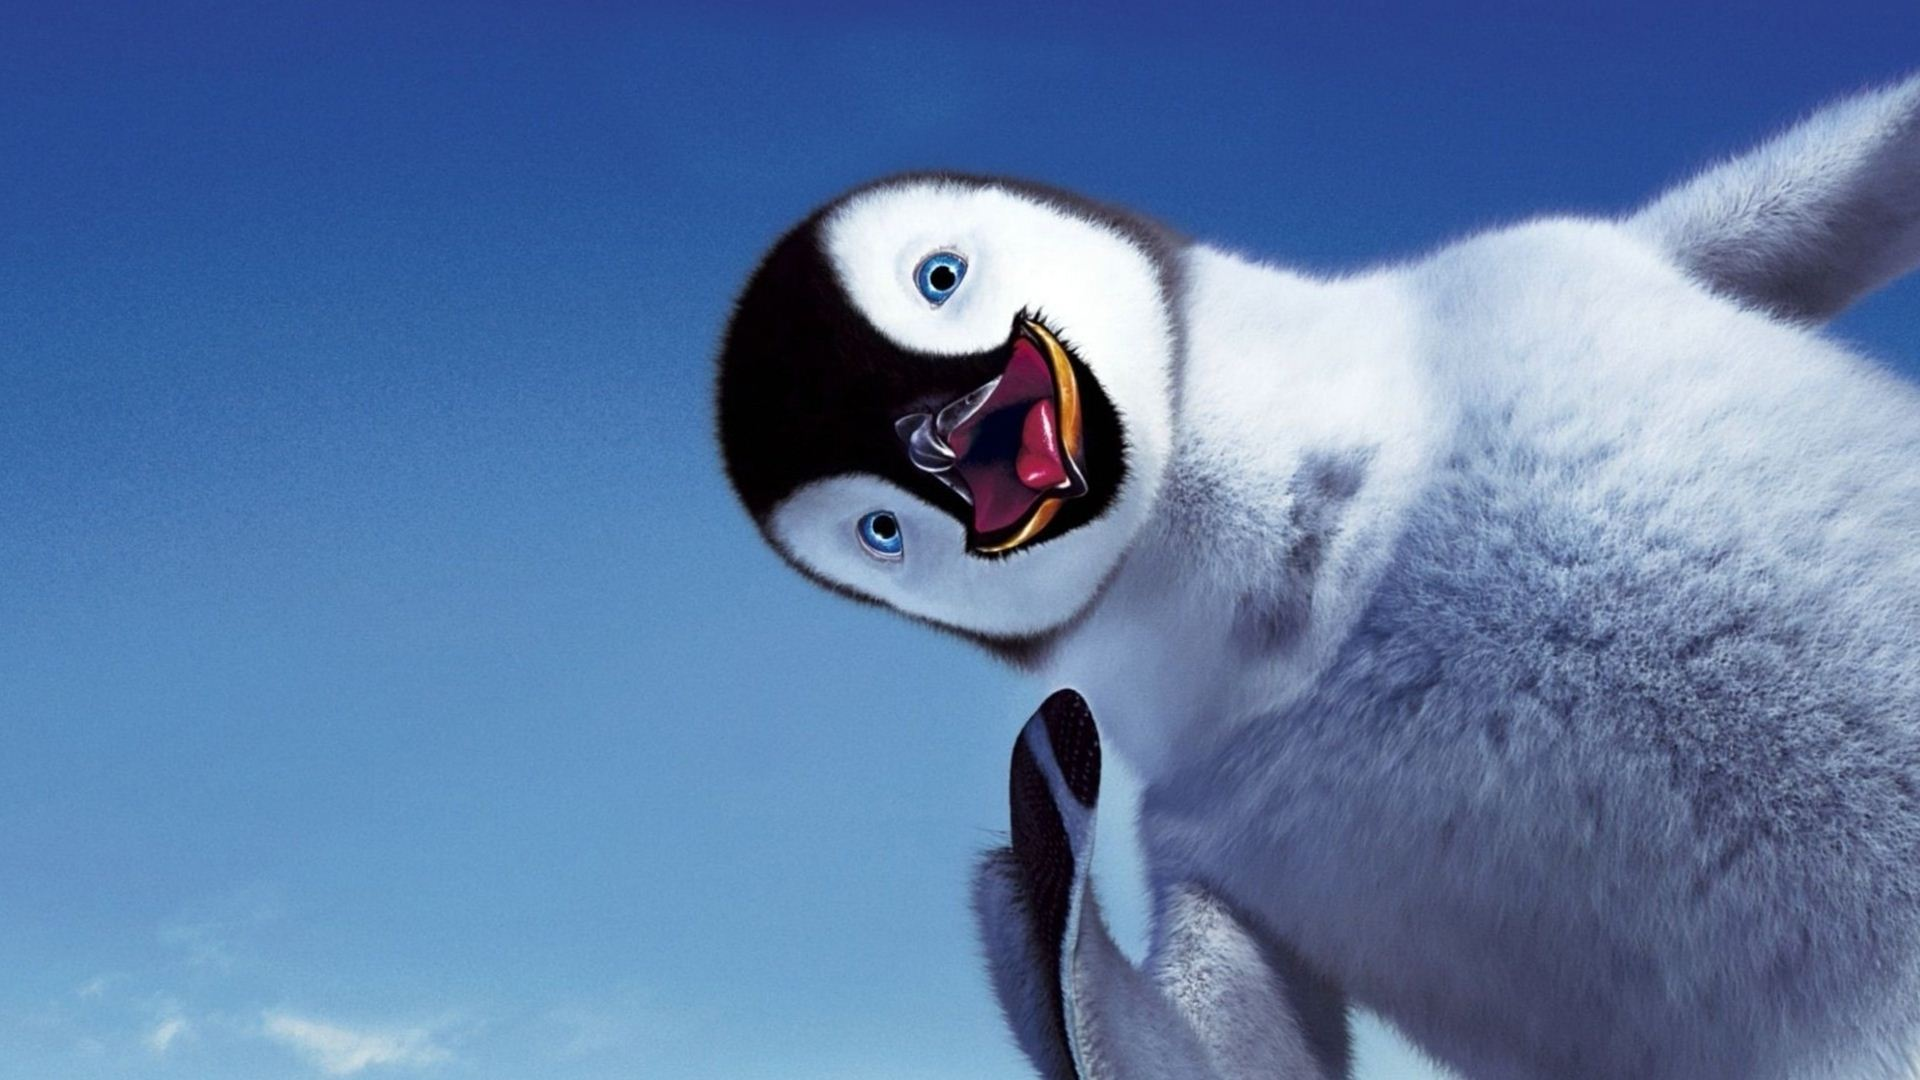 Funny Penguin Wallpaper Download   Cute Penguins Desktop 1920x1080